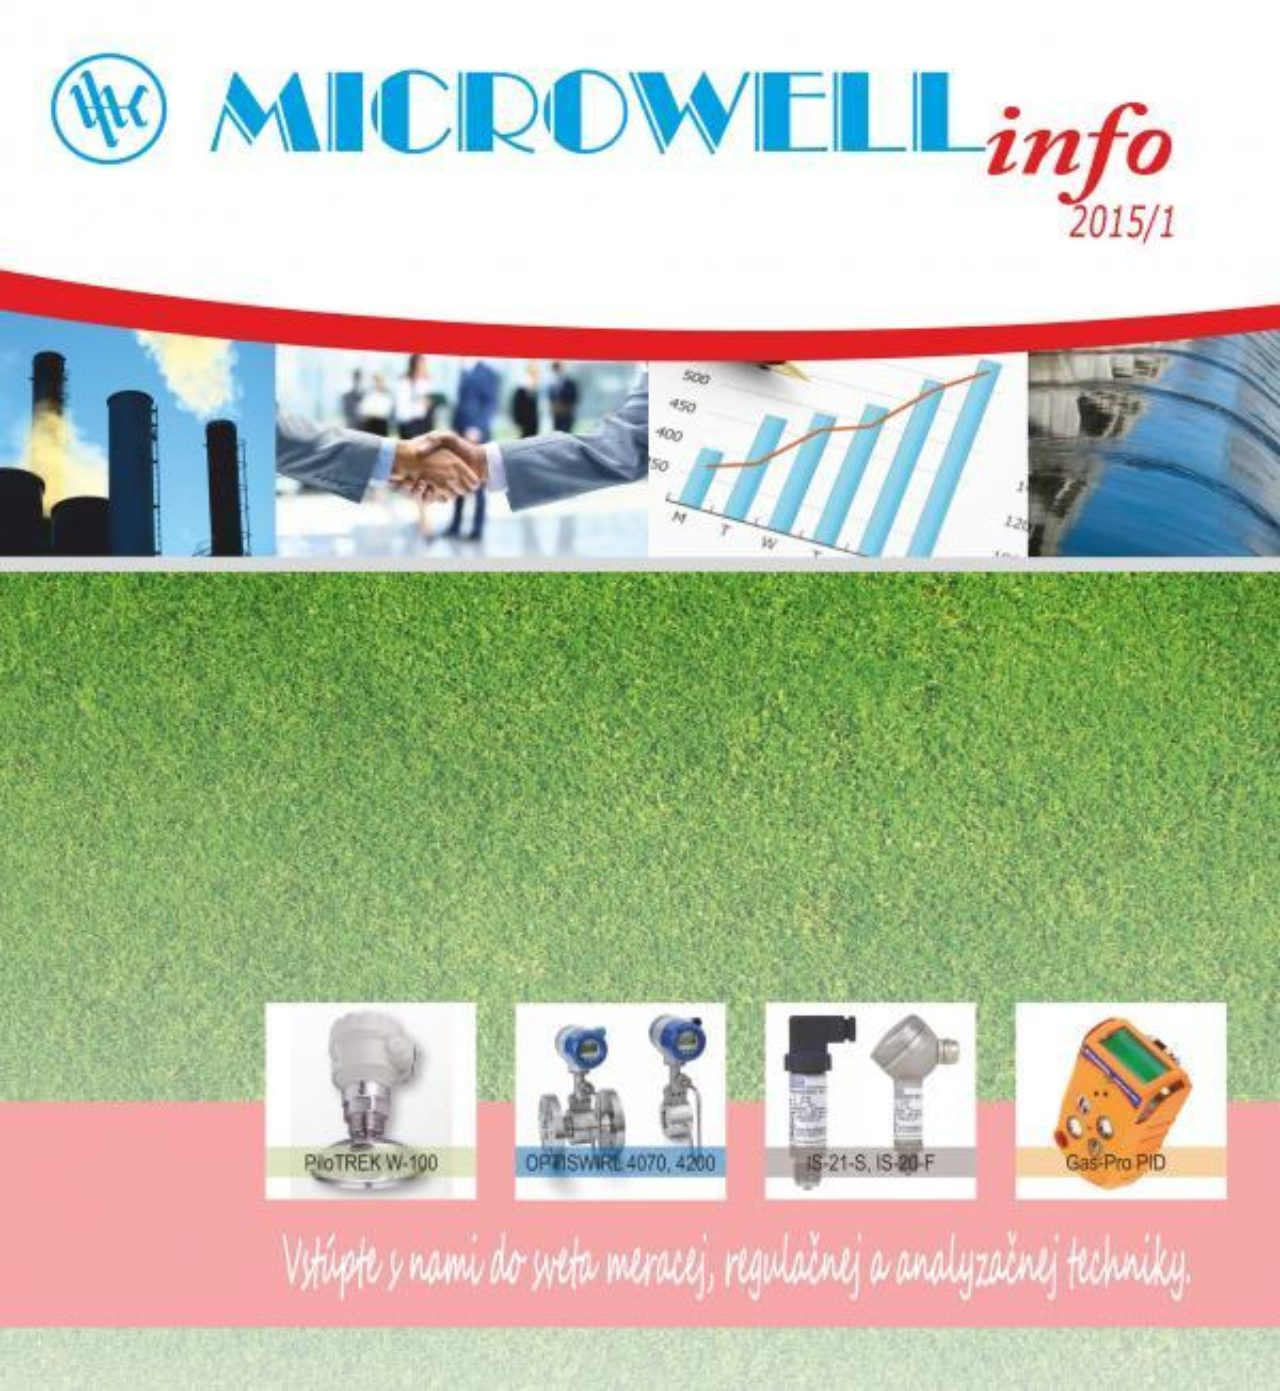 Microwell INFO jar-leto 2015 | Blog - Microwell